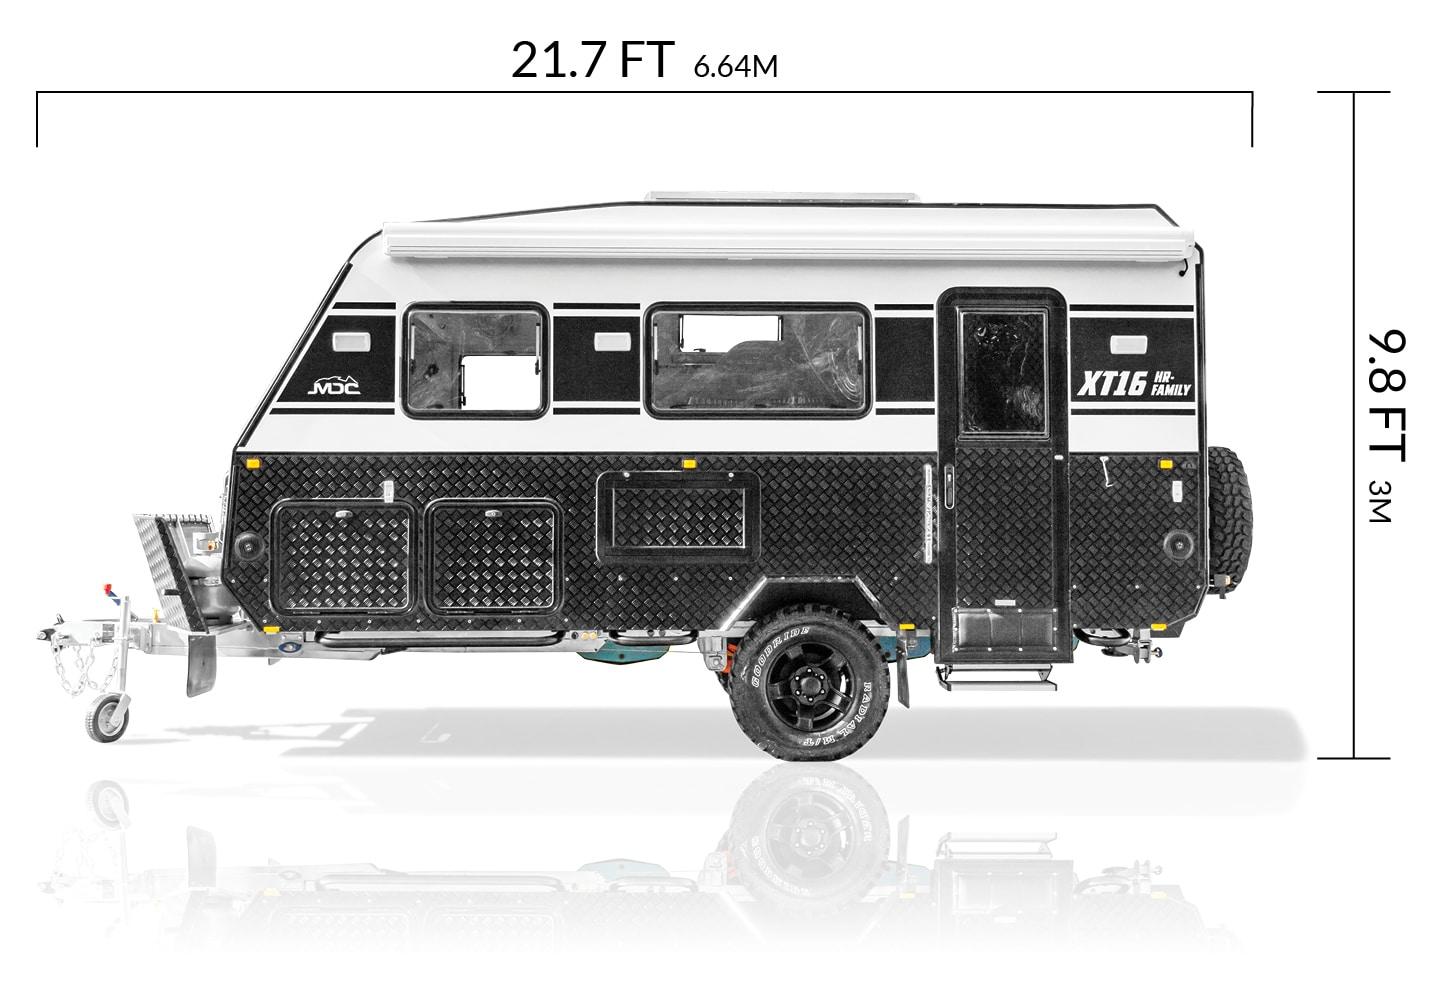 MDC USA XT16HR Family overlanding caravan dimensions